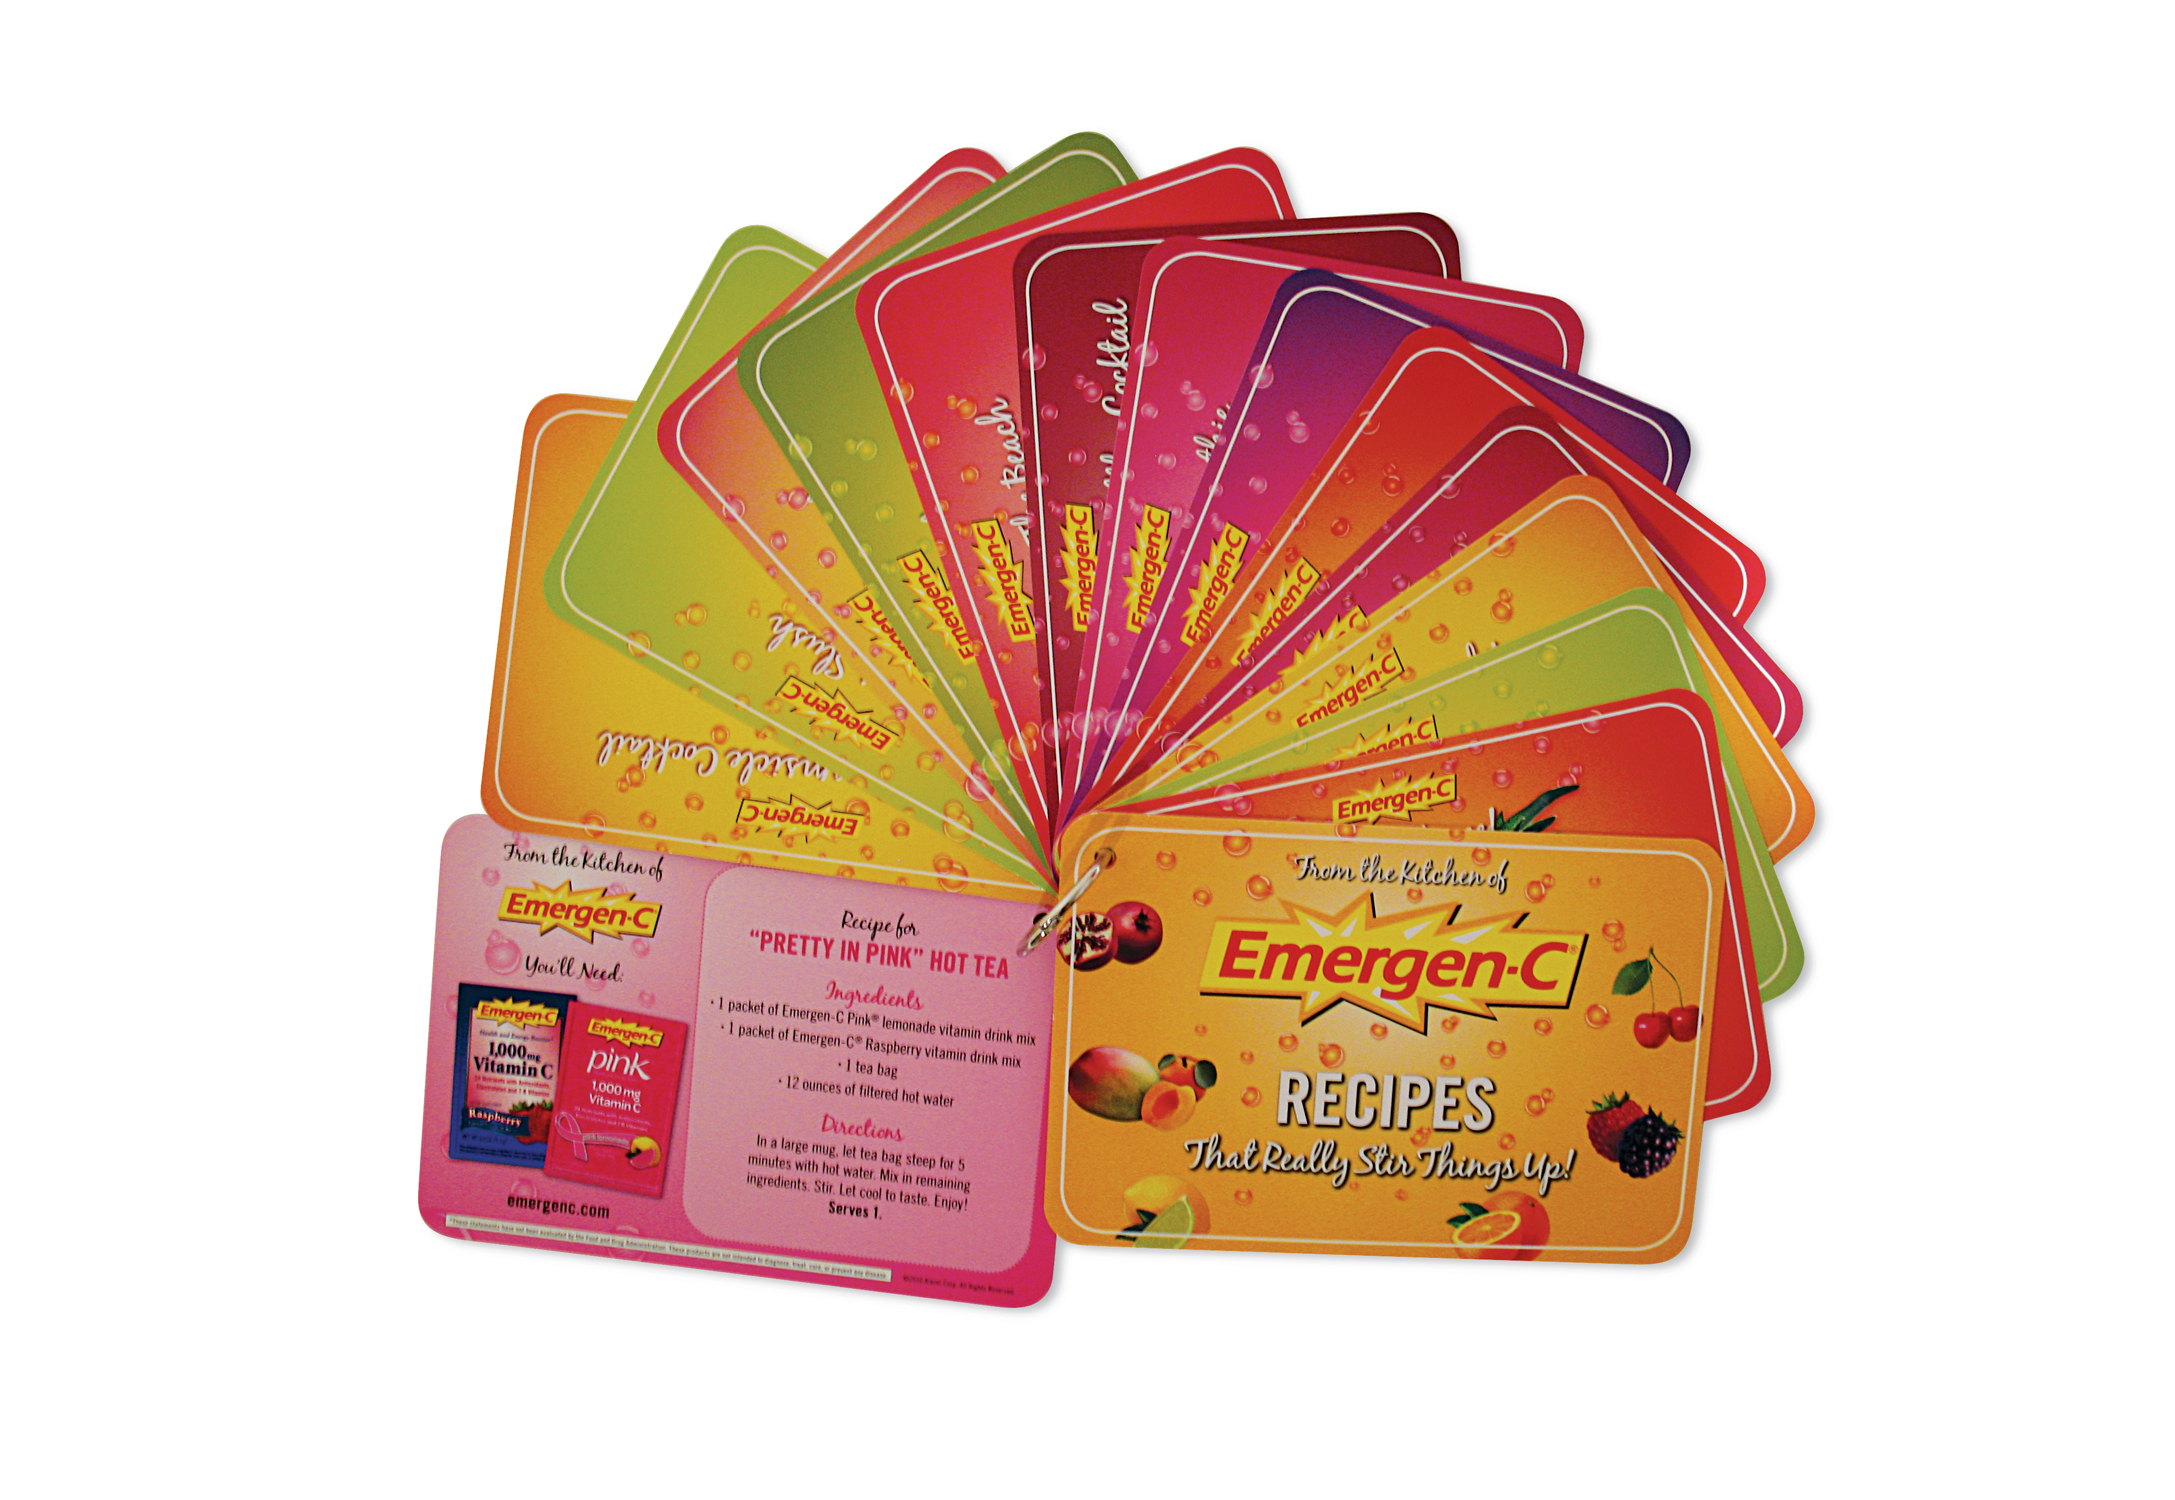 Emergen-C Recipe Cards